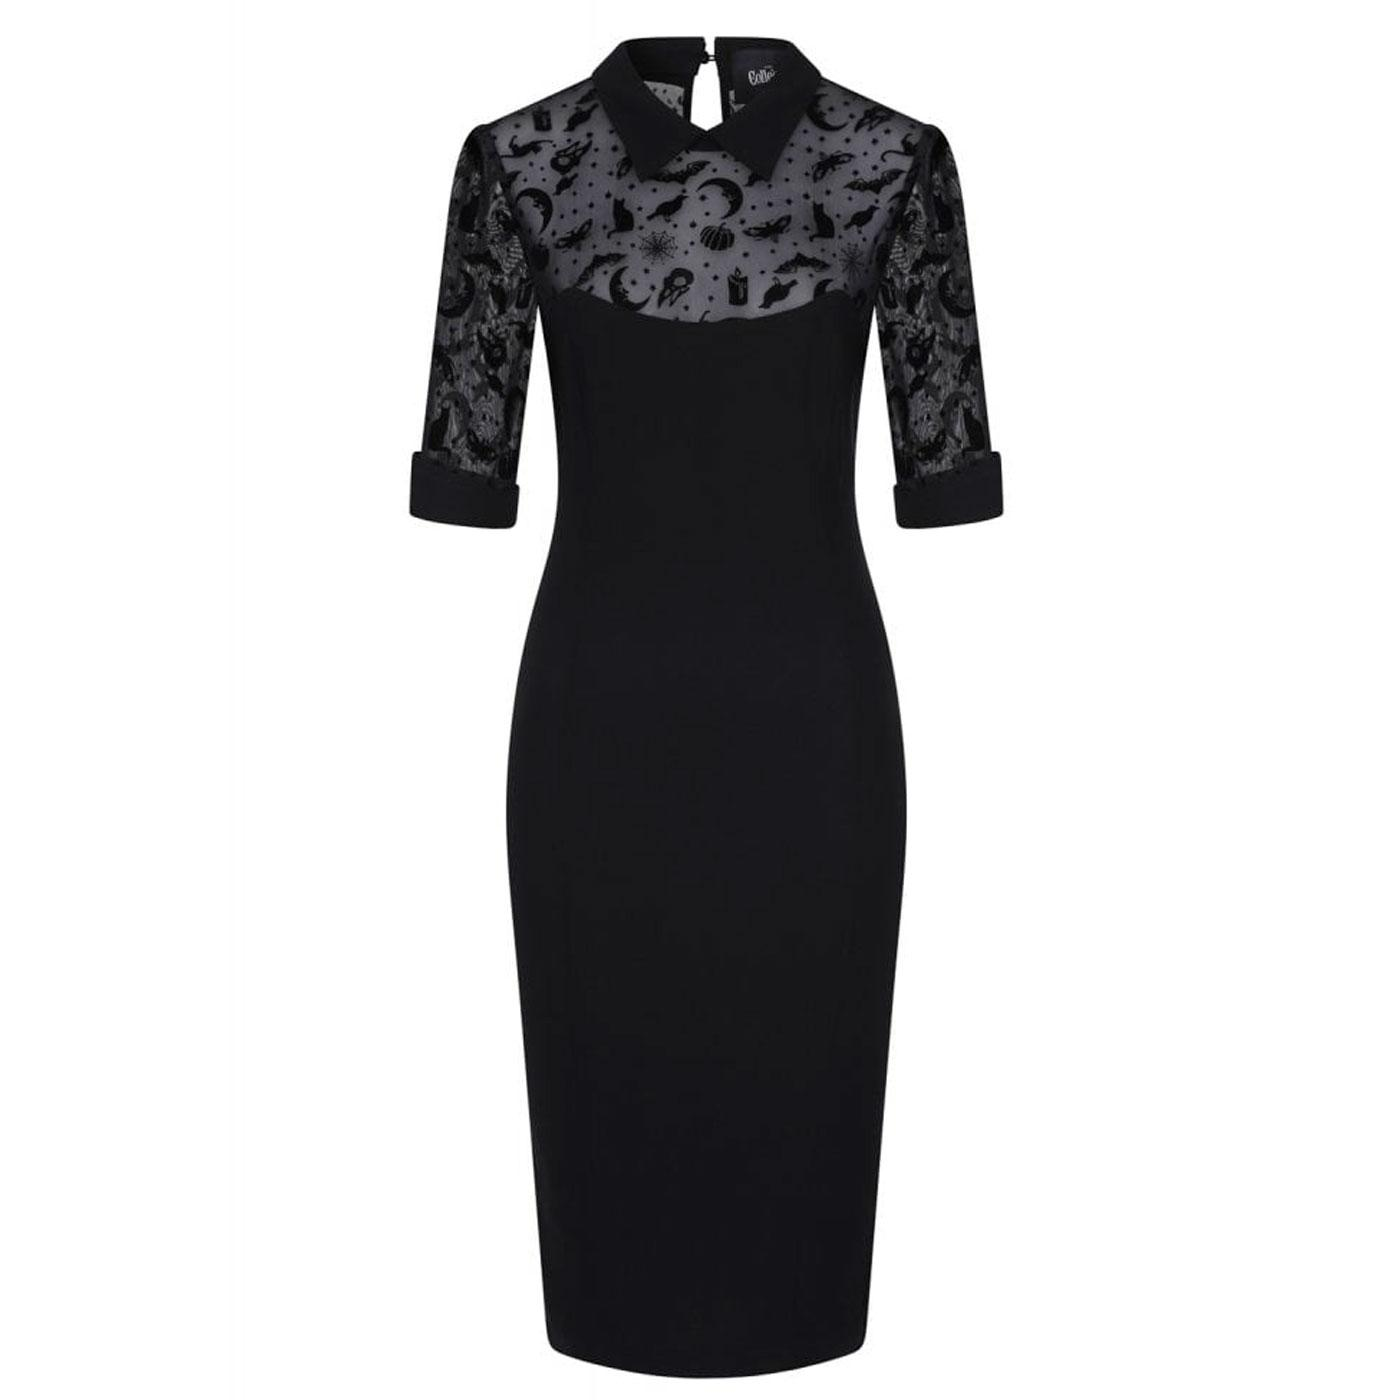 Wednesday COLLECTIF Magic Mesh Pencil Dress Black